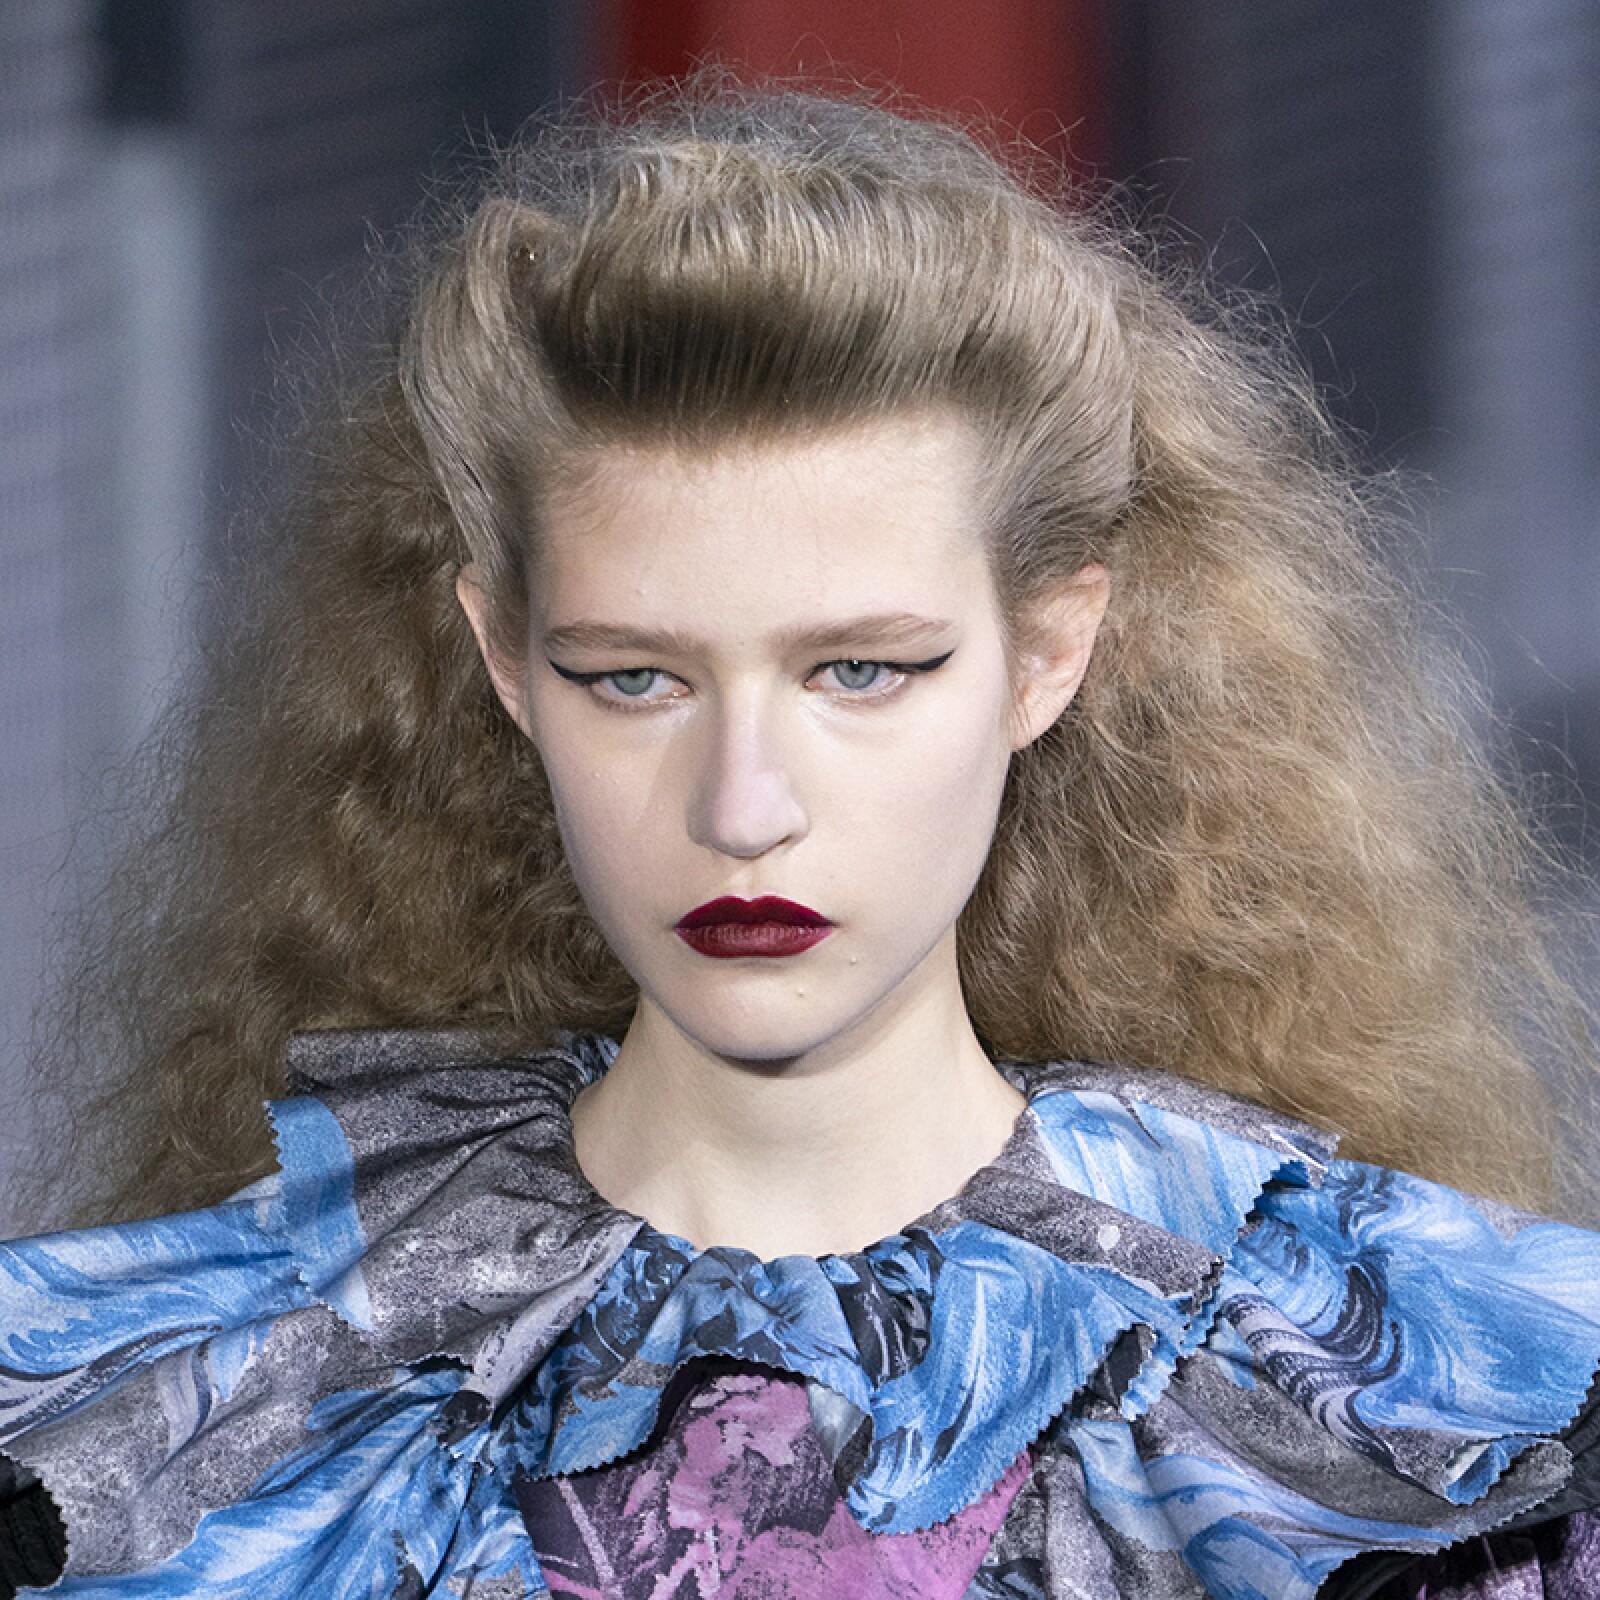 PFW-Paris-Fashion-Week-Runway-Pasarela-Beauty-Look-Belleza-Louis-Vuitton